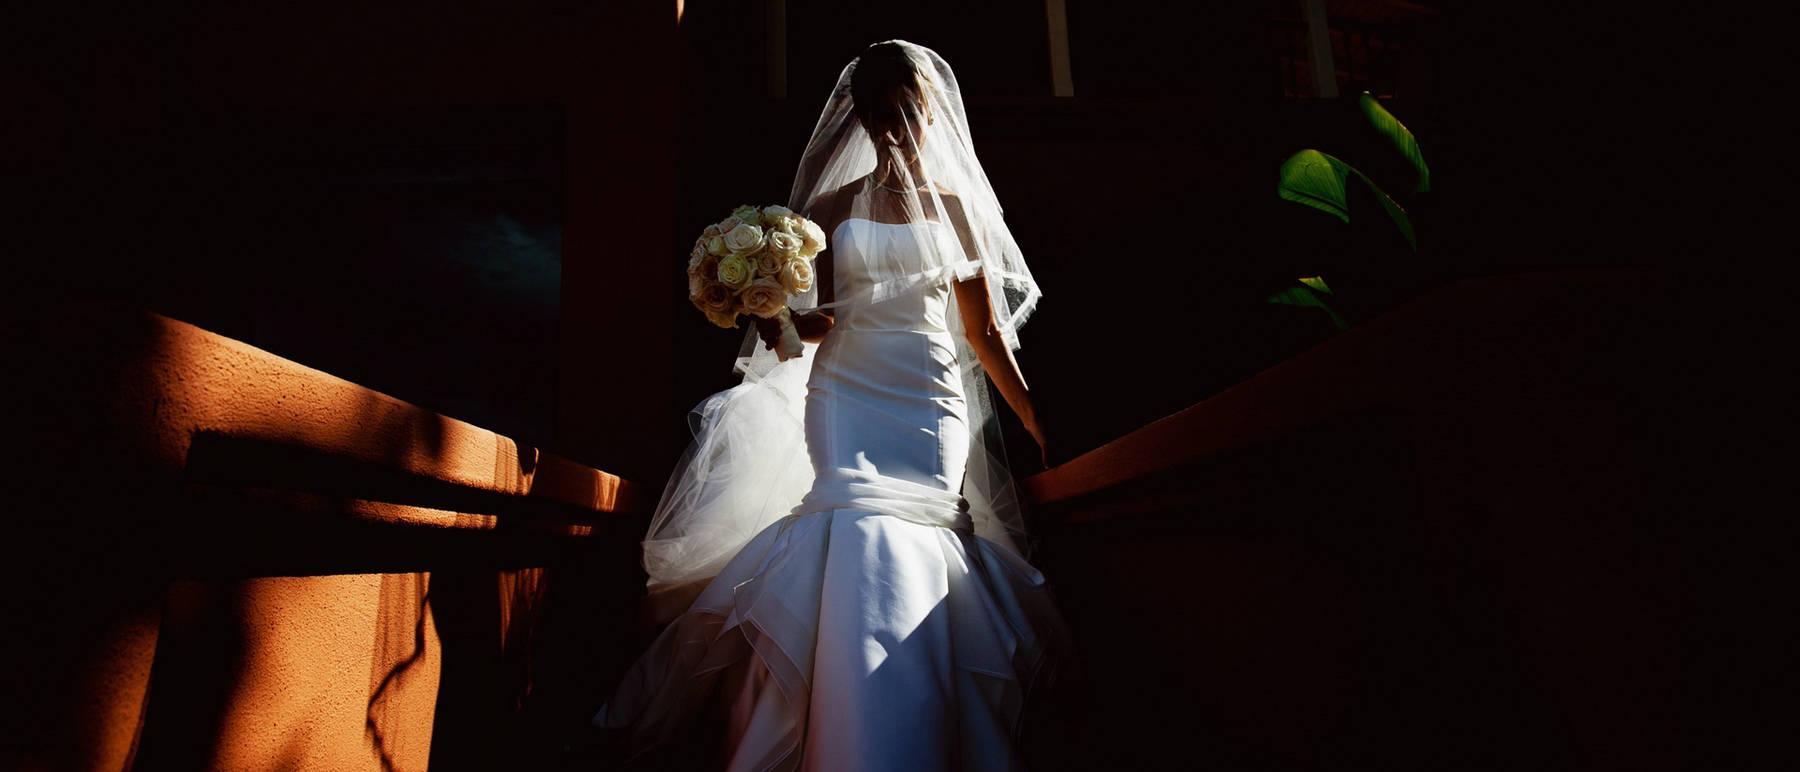 johnandjoseph-wedding-photographer-hz-slider-324